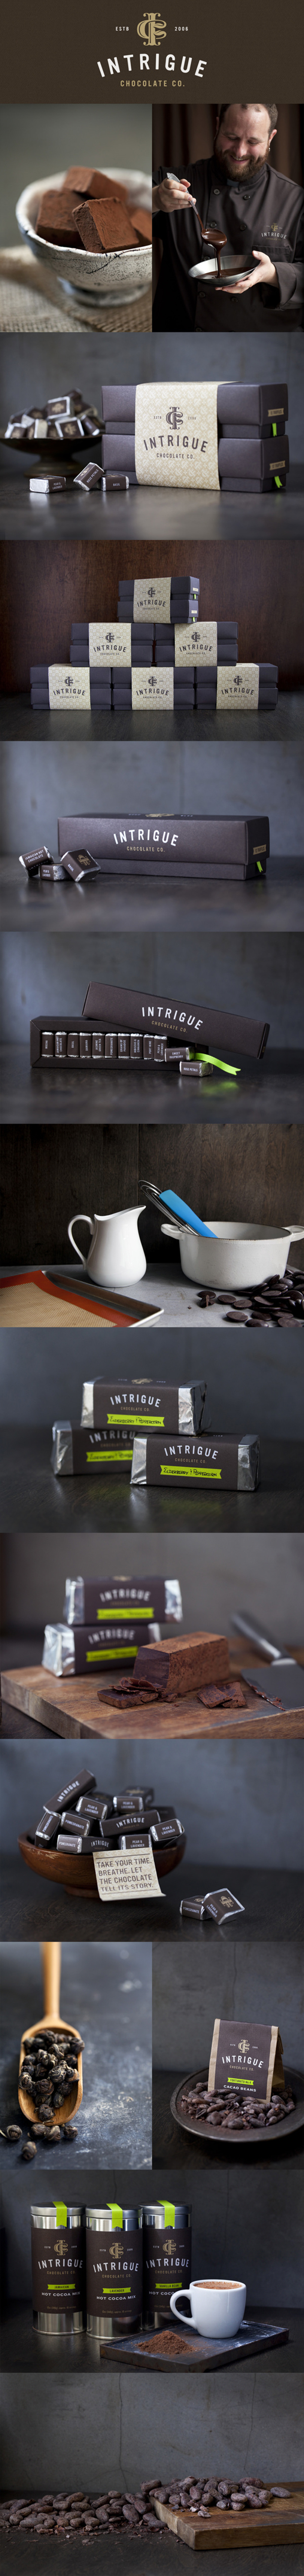 Intrigue Chocolate Co.